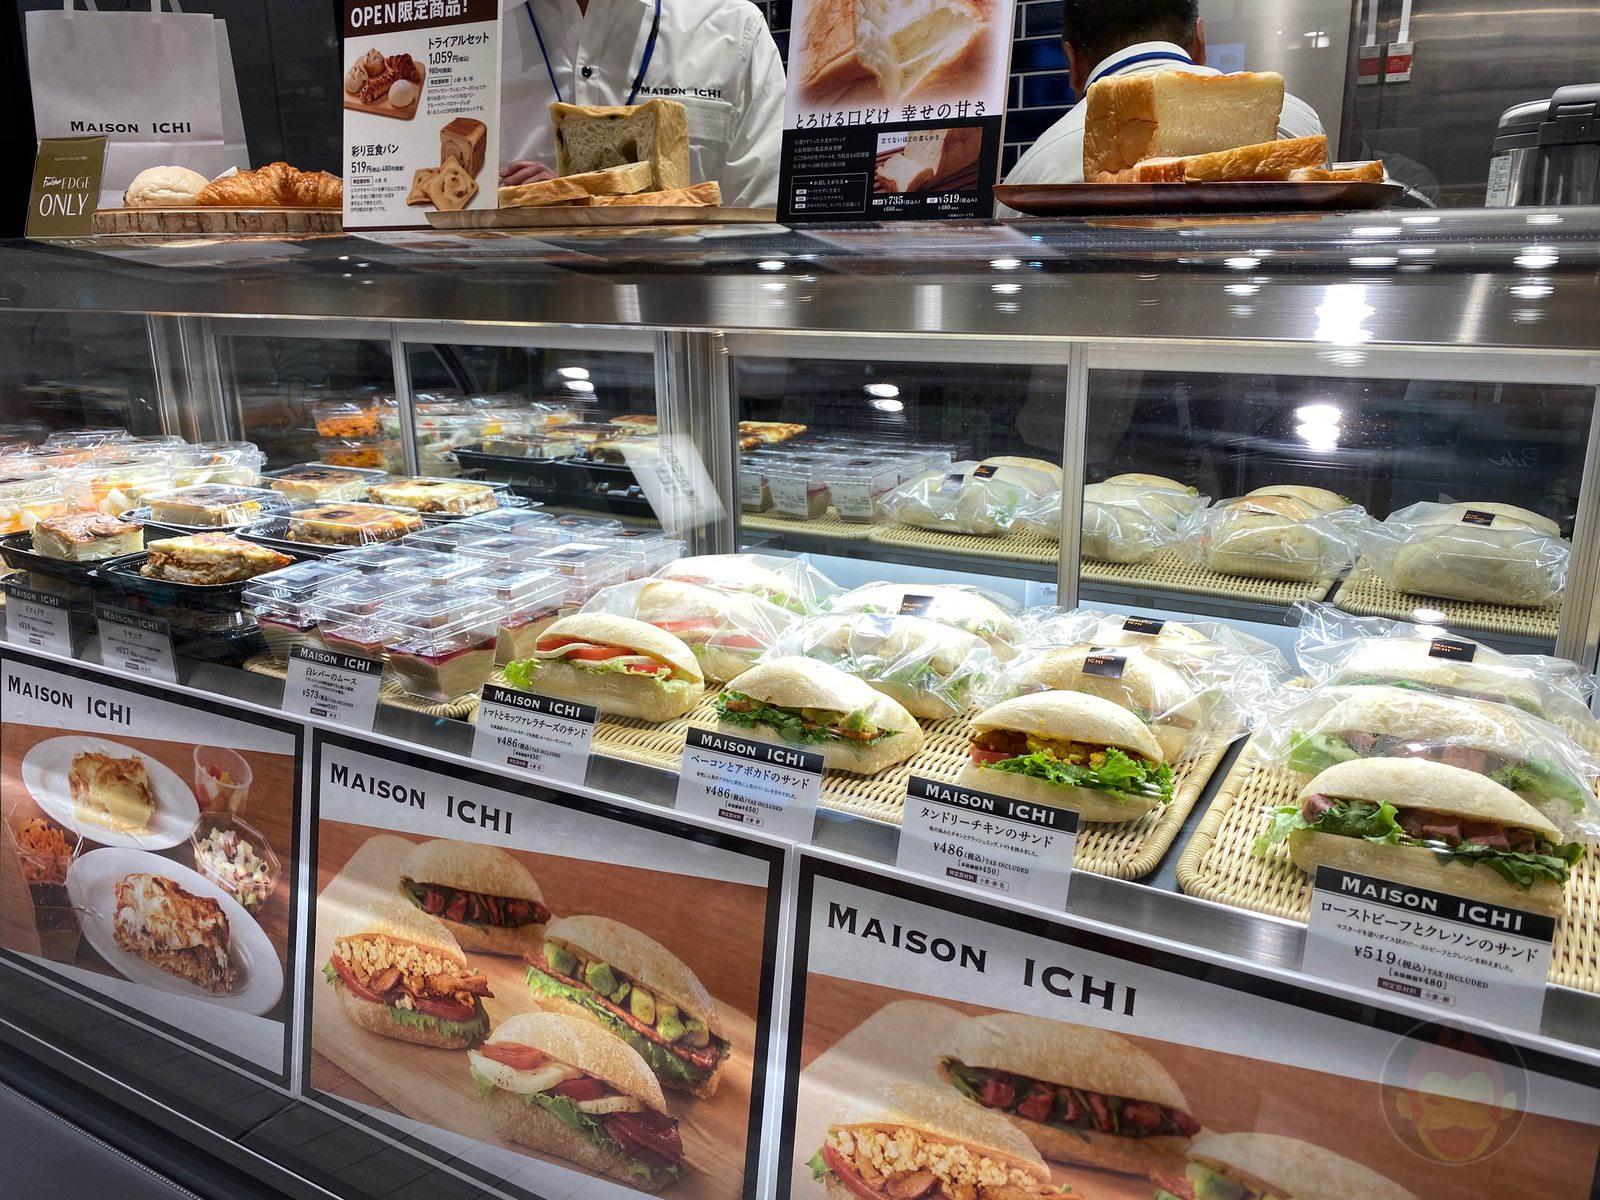 Shibuya-Scramble-Square-Food-I-Ate-95.jpeg